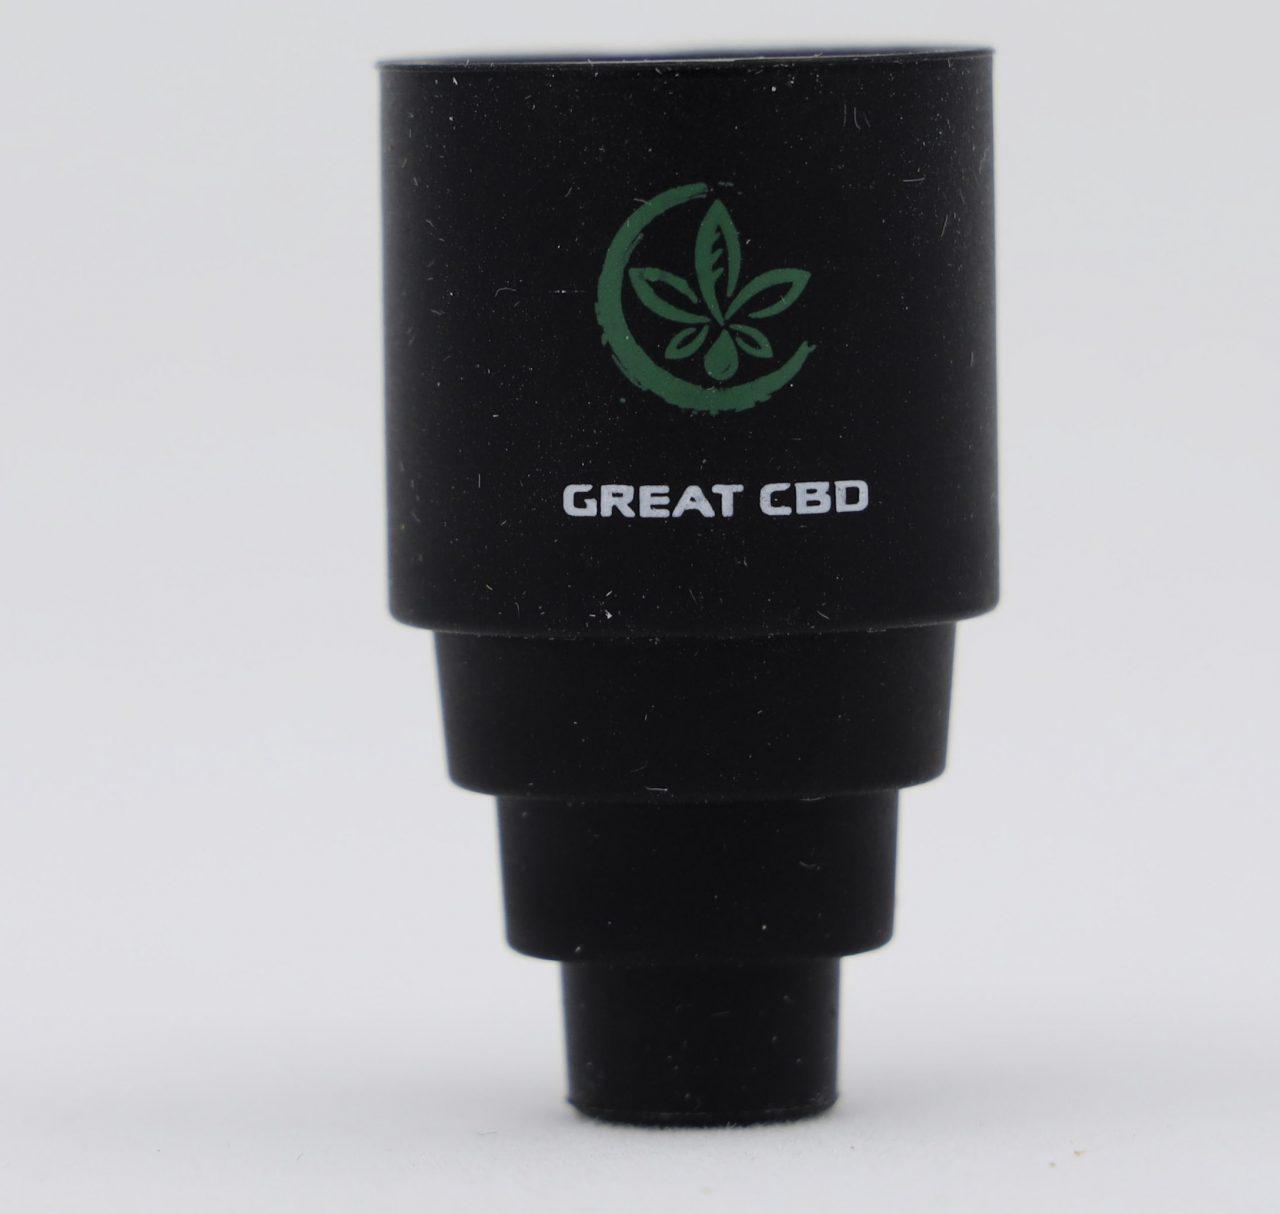 Great CBD Shop G Cap DabCap vaporizer to water pipe attachment 1